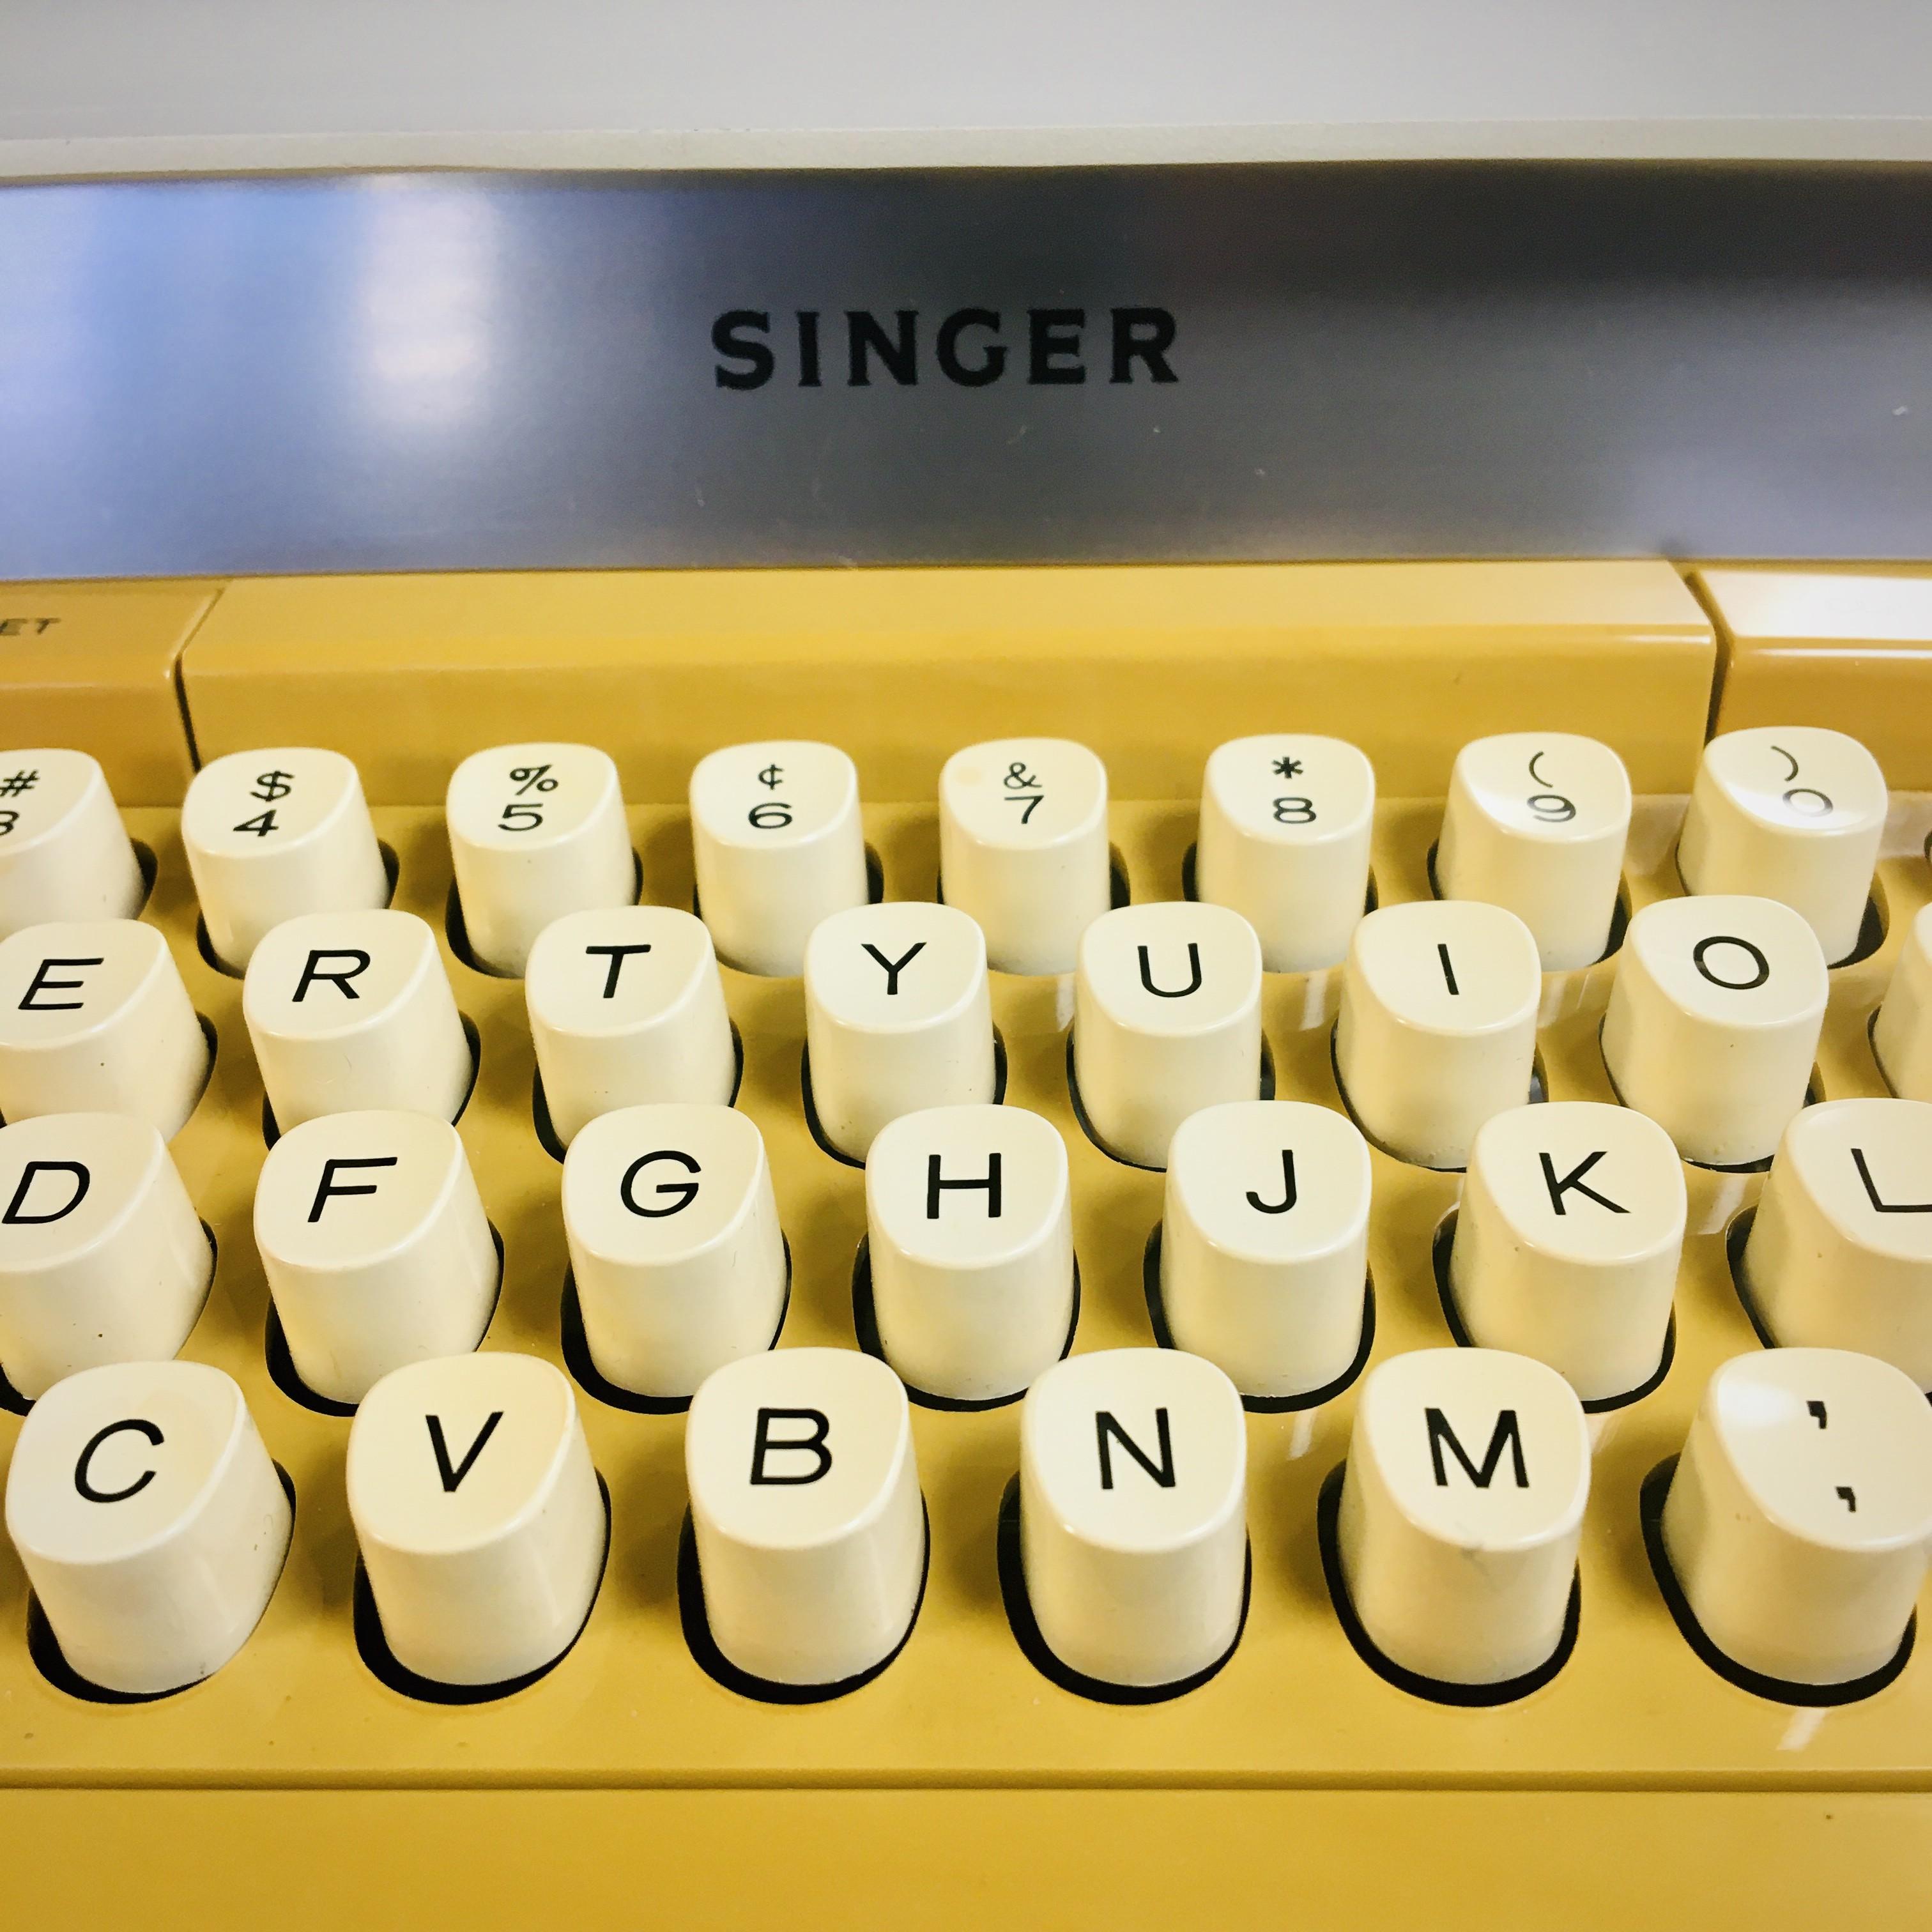 Singer Electric